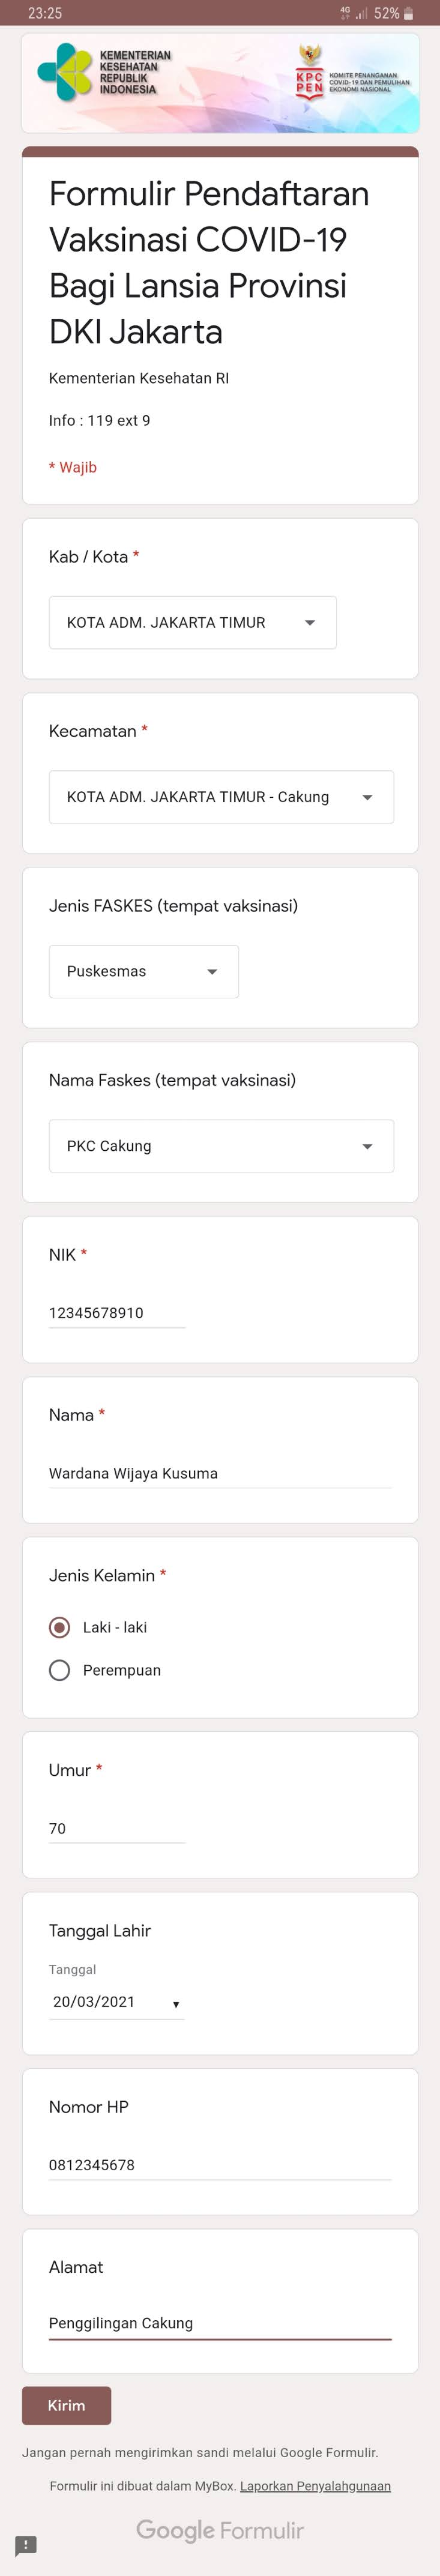 Tata Cara isi data Formulir Online Suntik Vaksin Covid-19